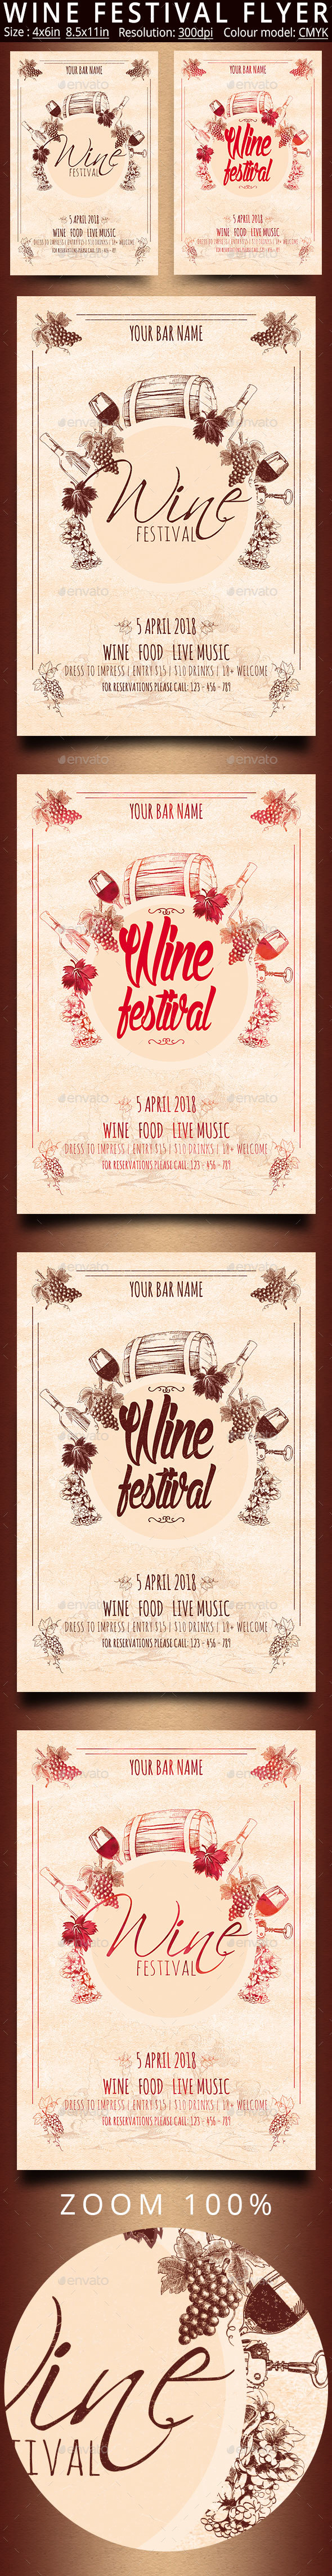 Wine Festival Vintage Flyer - Events Flyers